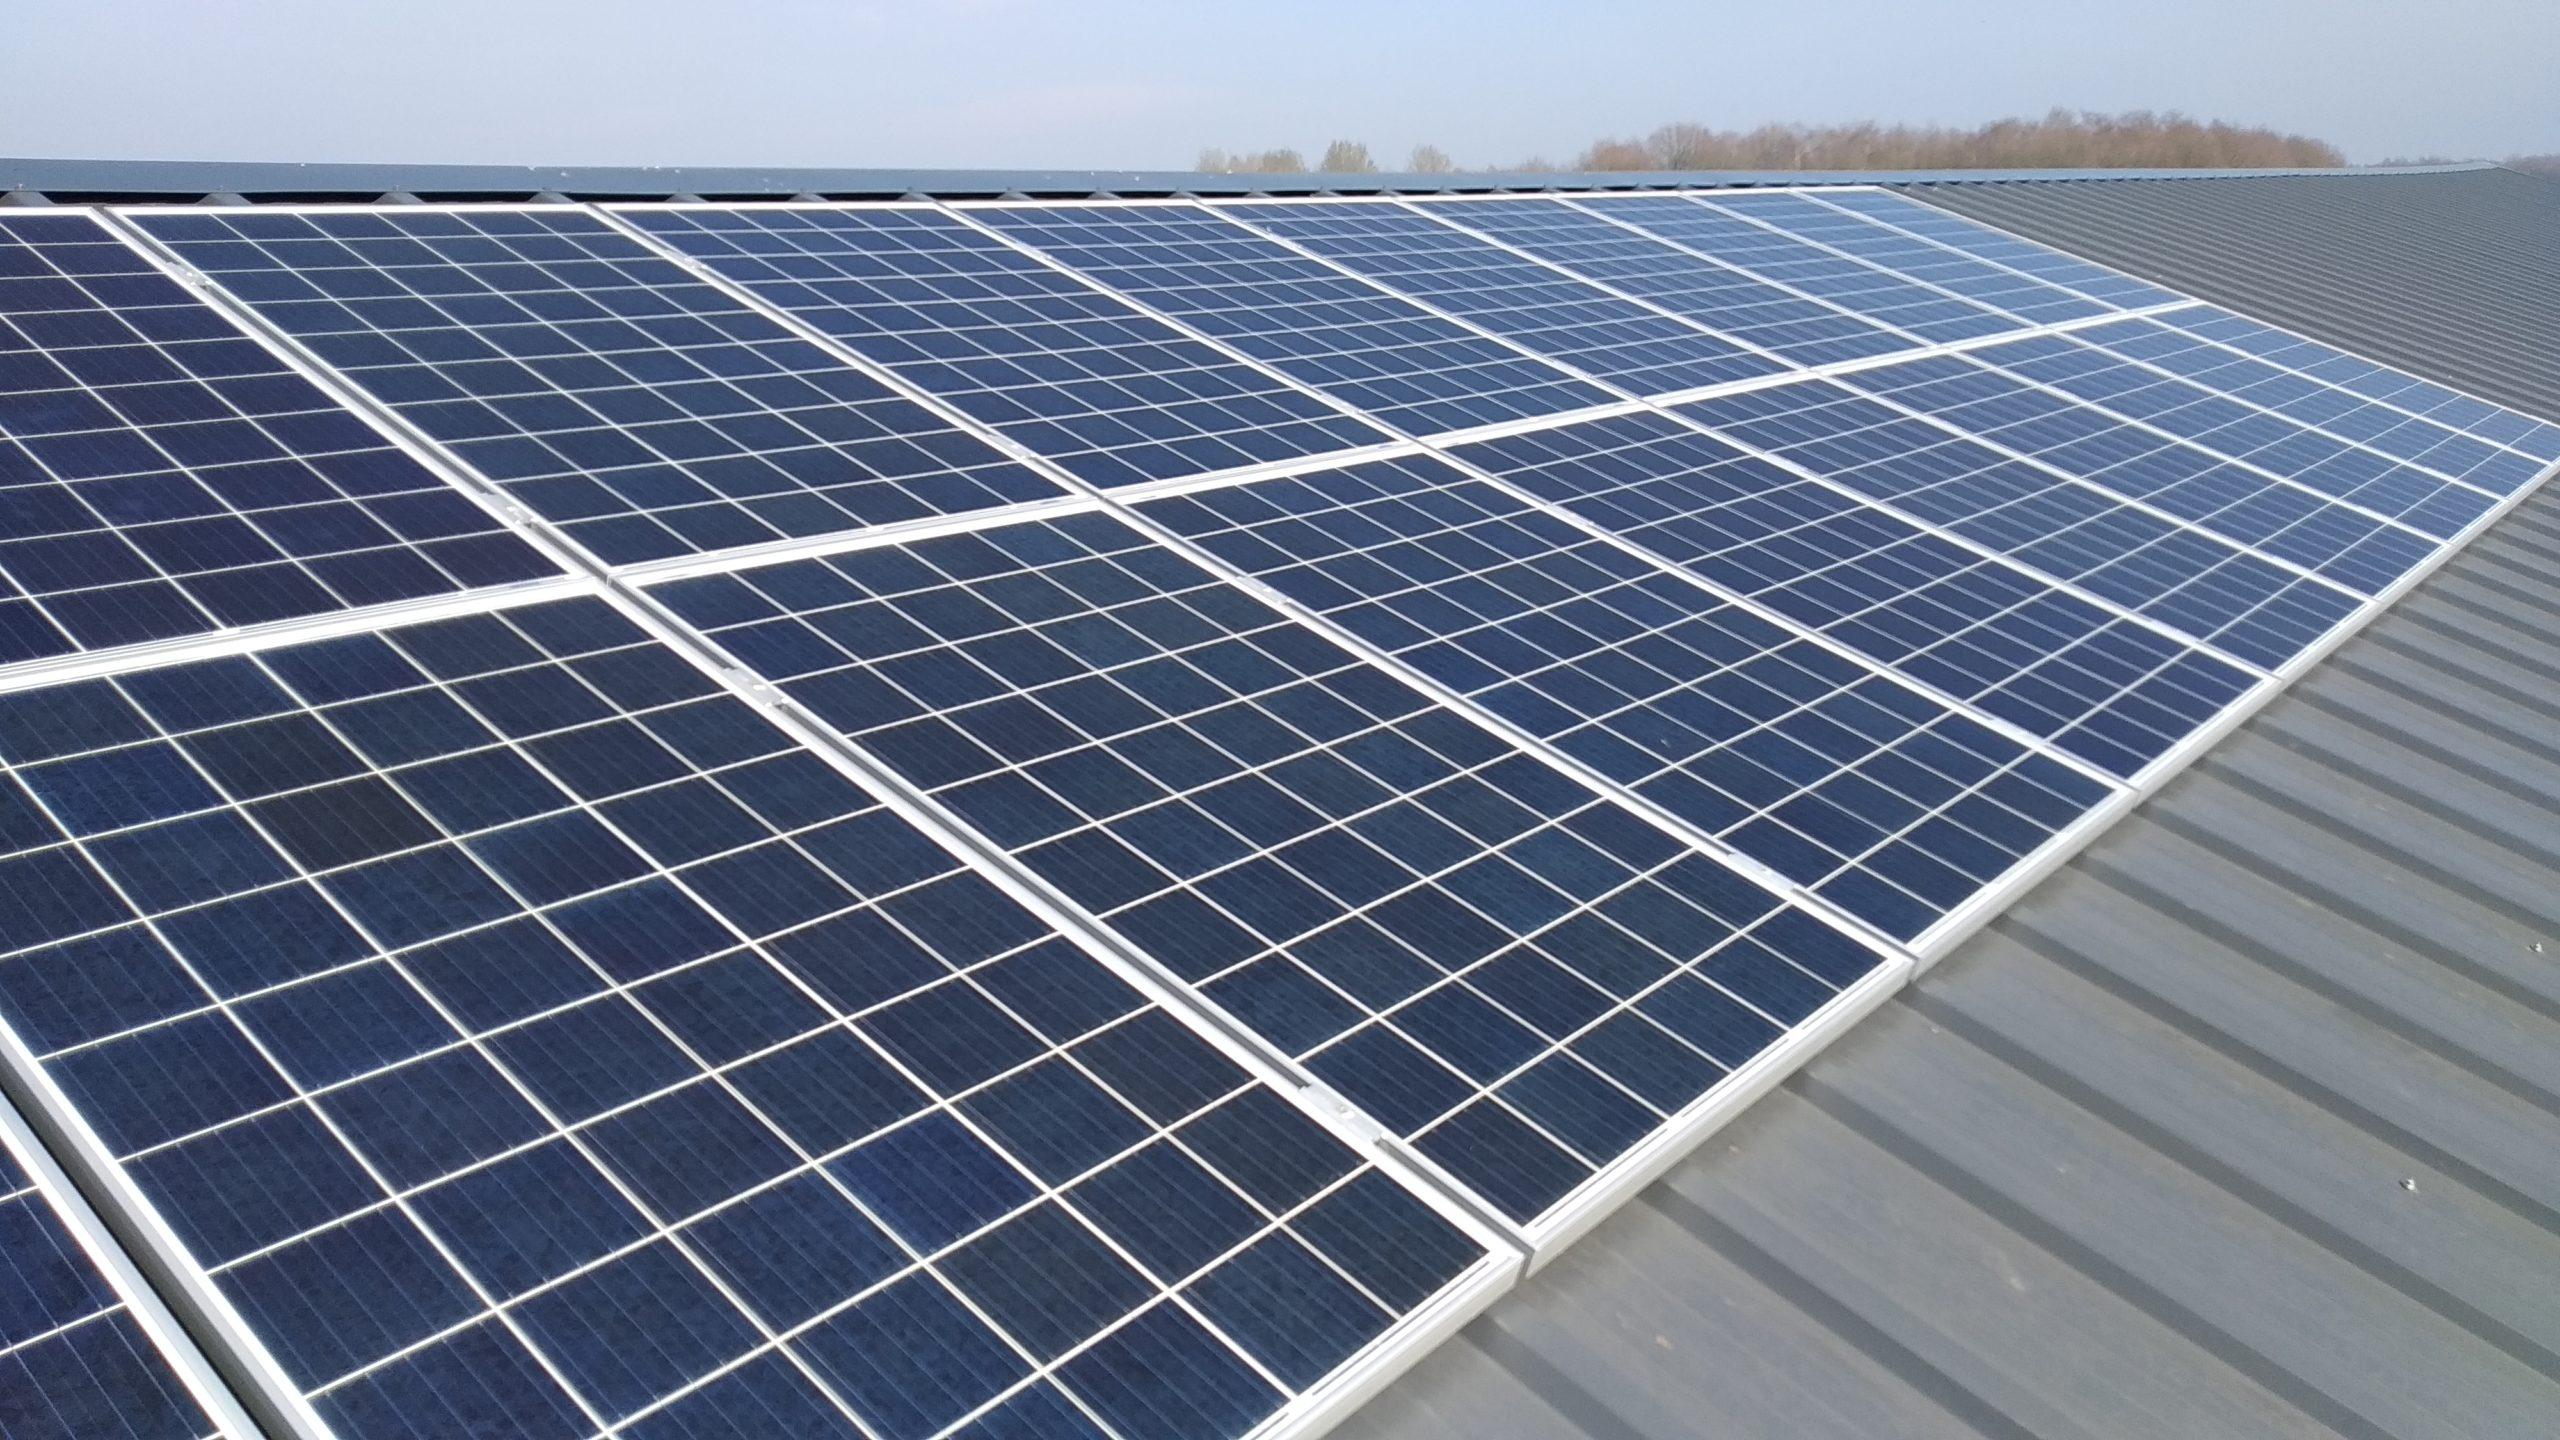 IBC zonnepanelen Papenvoort